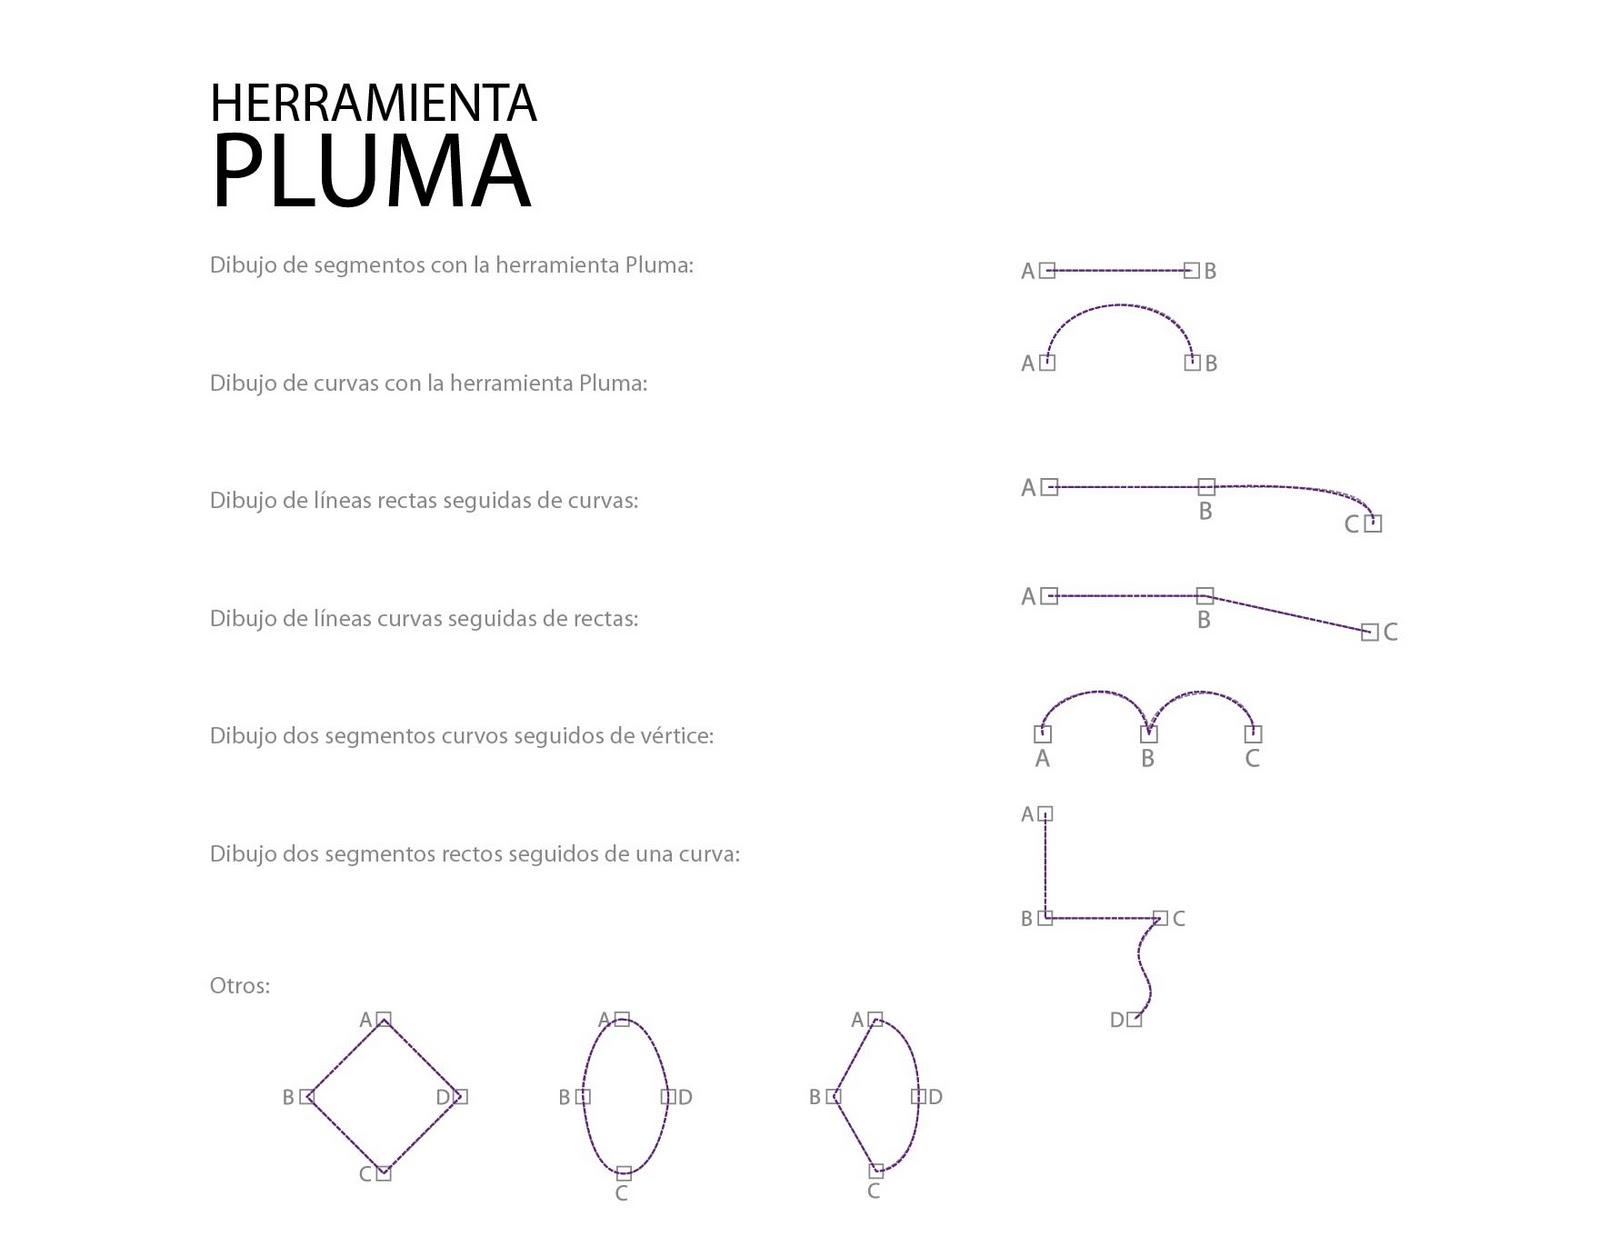 eissaQ: Pluma en Illustrator cs5